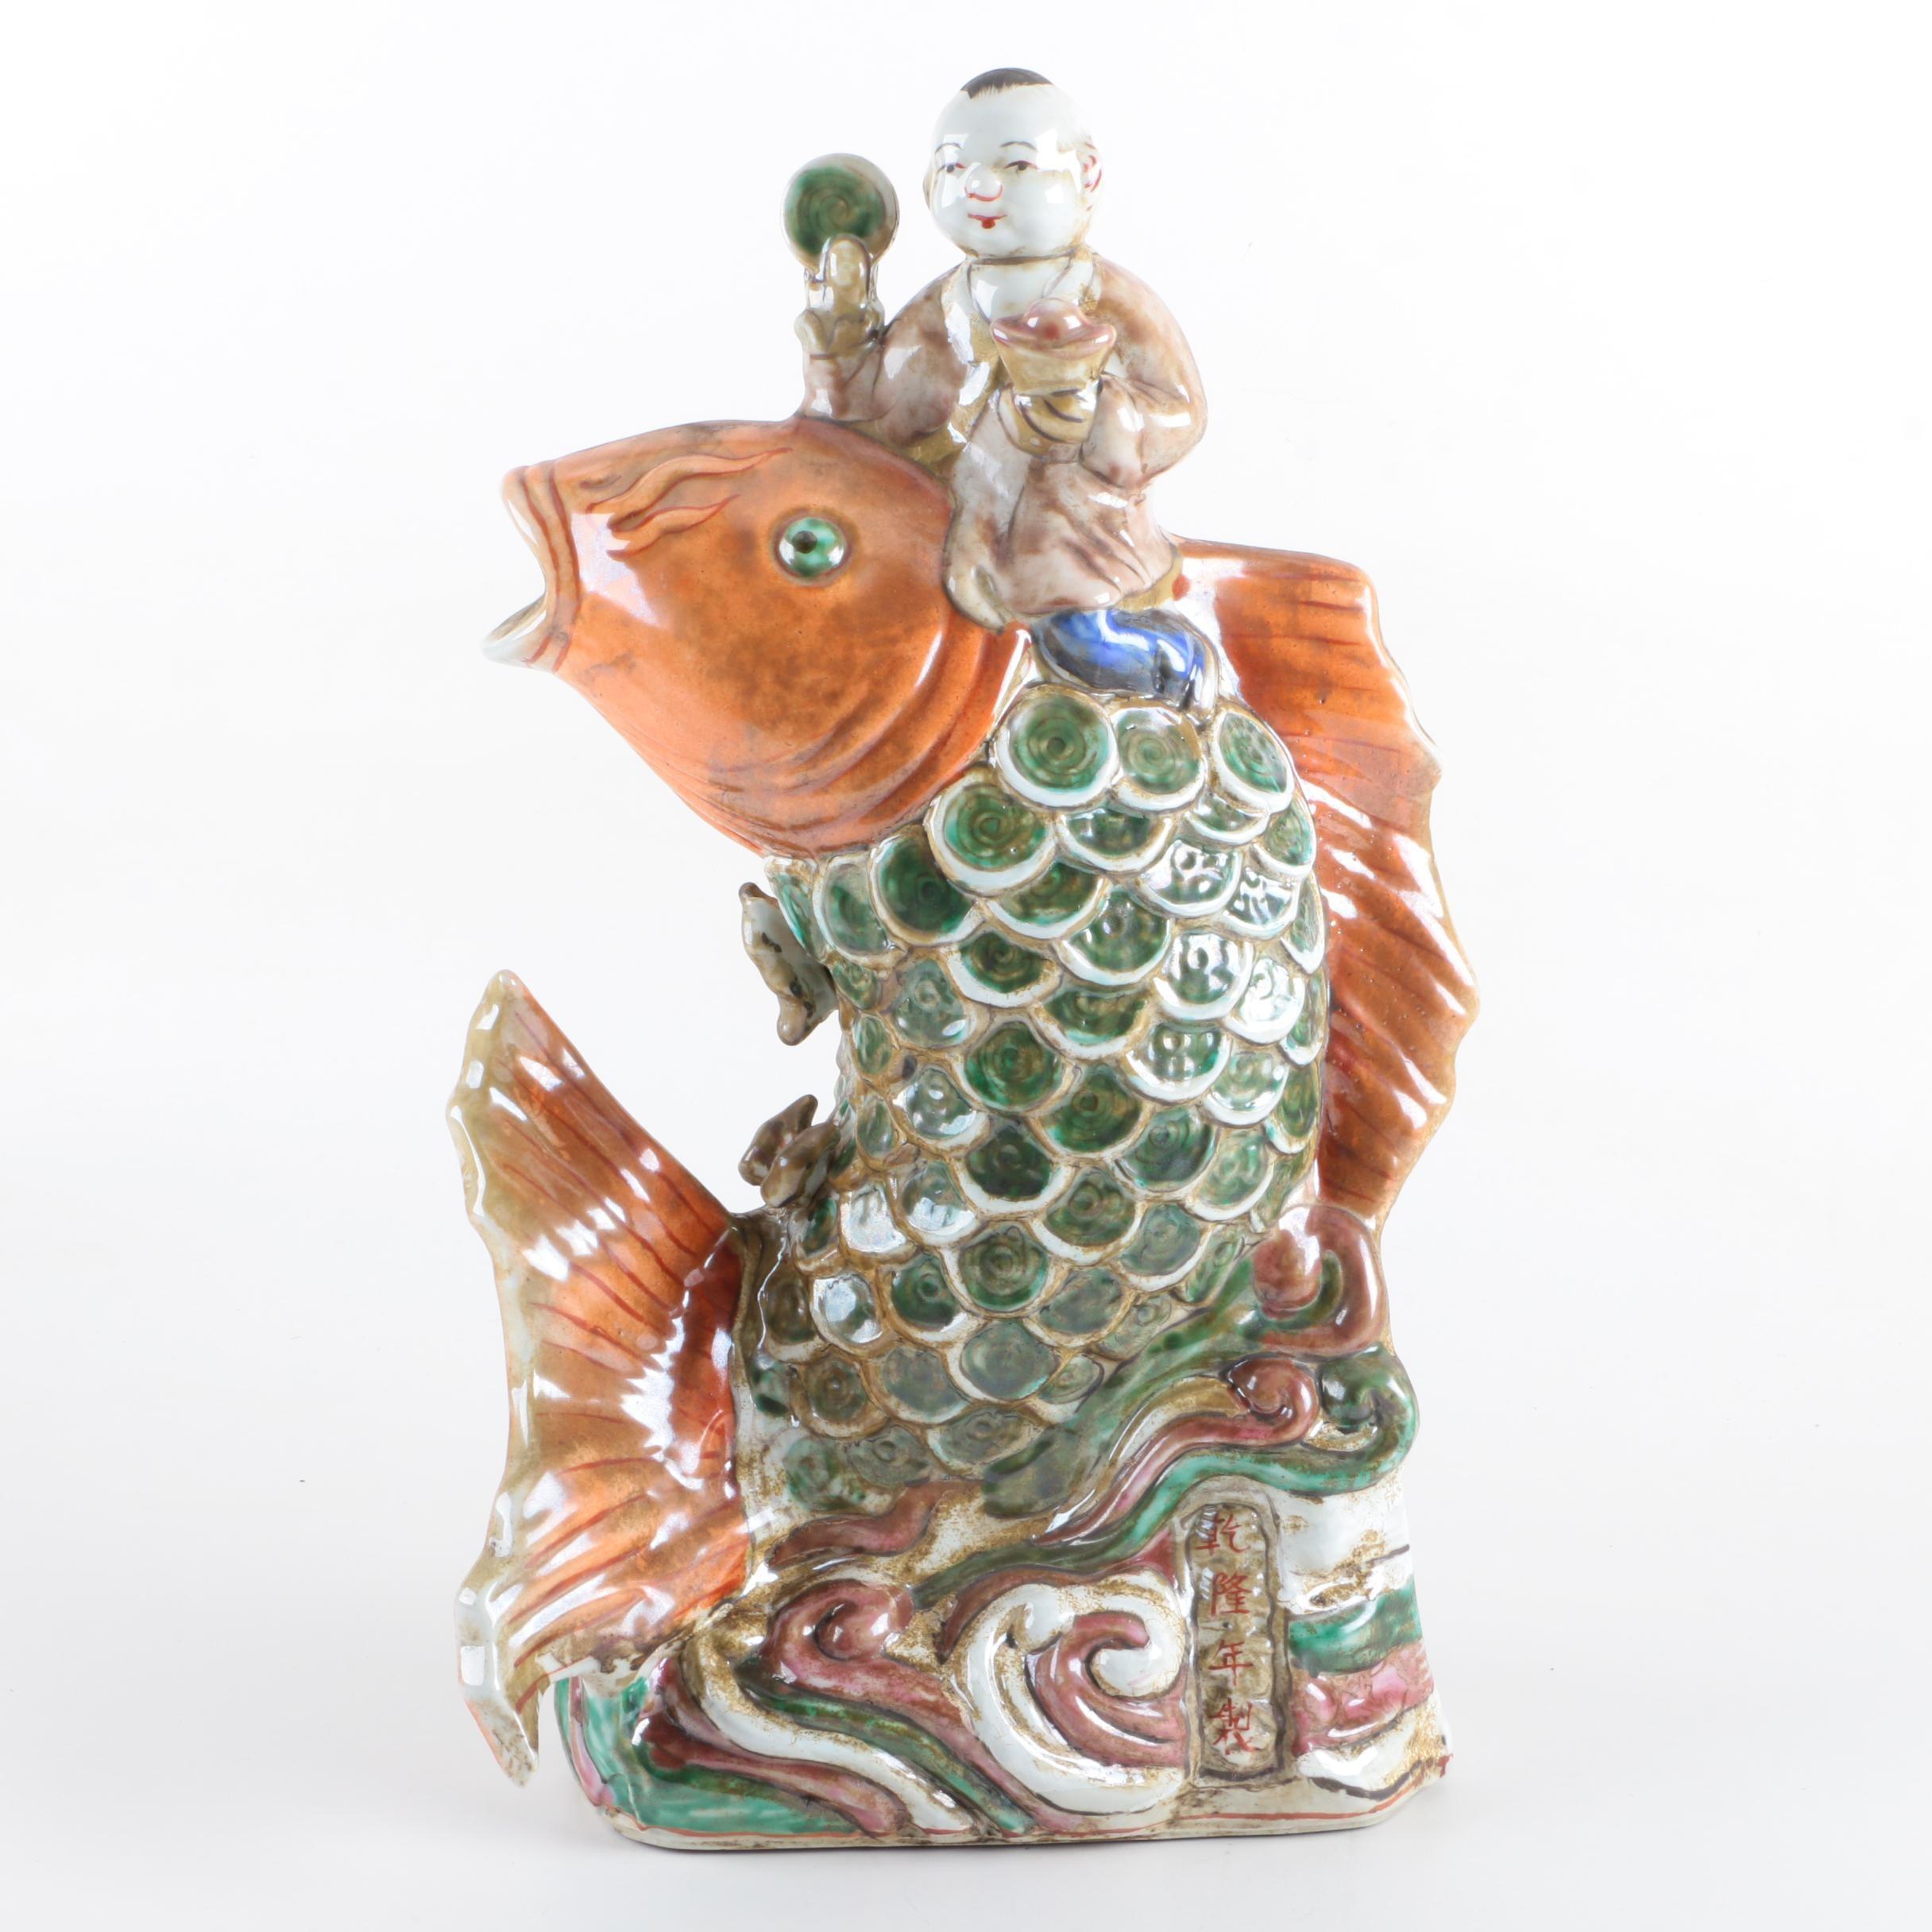 Chinese Ceramic Figurine Riding Large Koi Fish